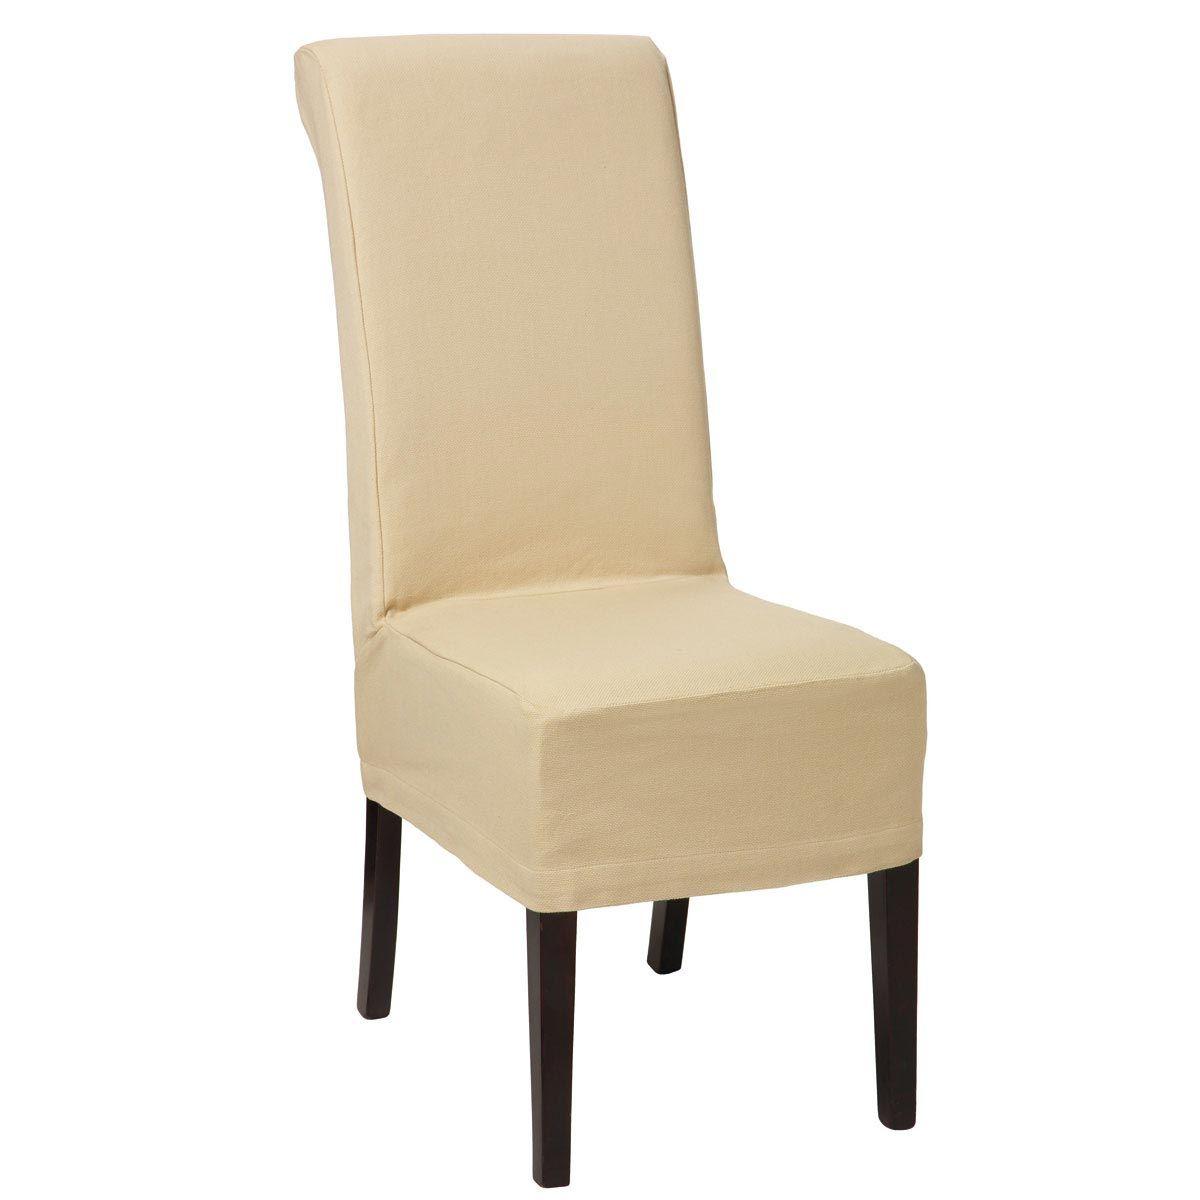 Dining chair covers ukdining chair covers uk   design ideas 2017 2018   Pinterest  . Dining Chair Cushion Covers Uk. Home Design Ideas